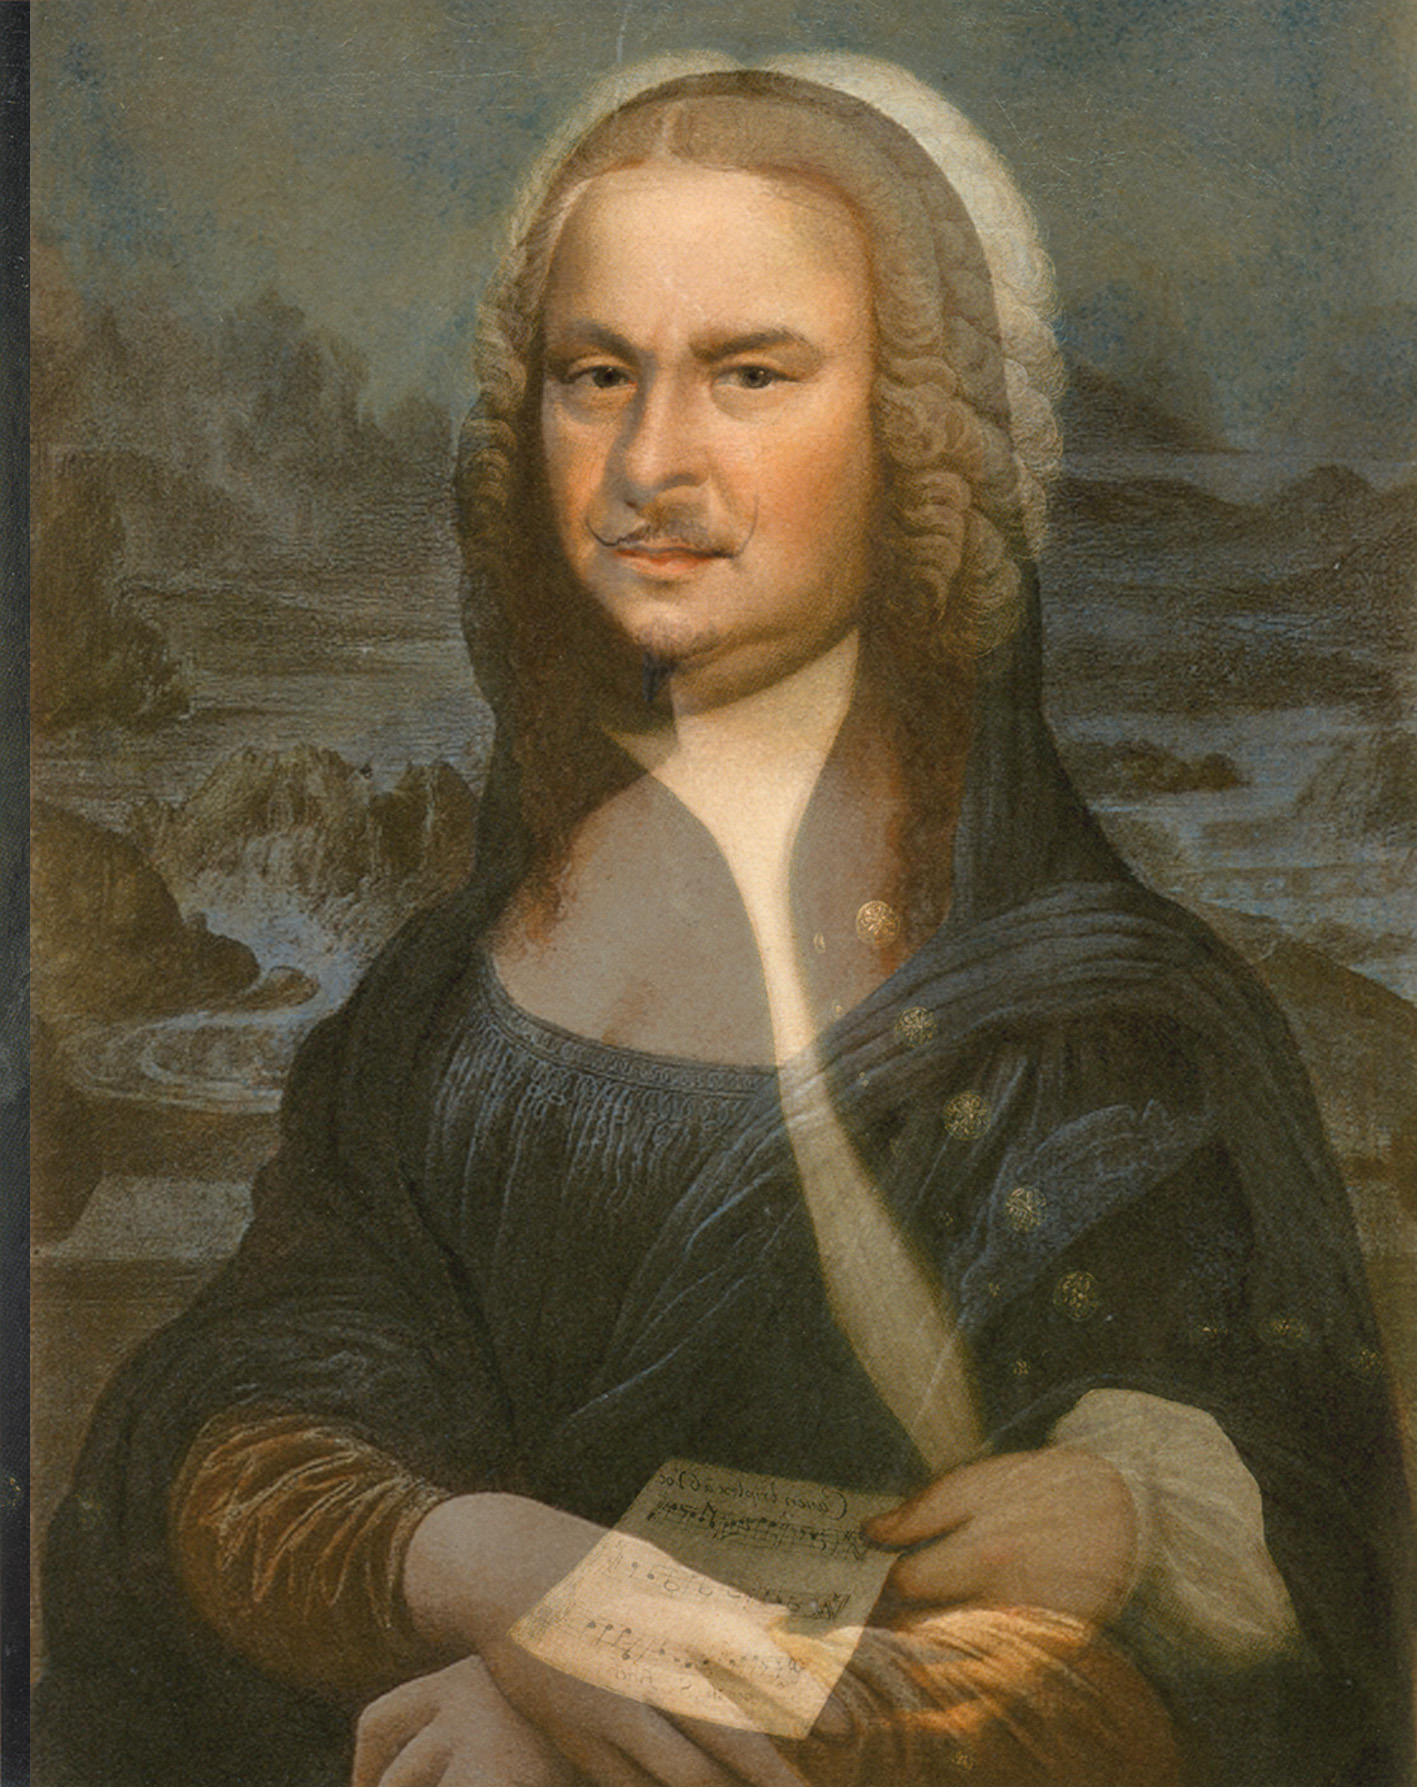 Johann Sebastian Bach; painting by Elias Gottlob Haussmann, 1746